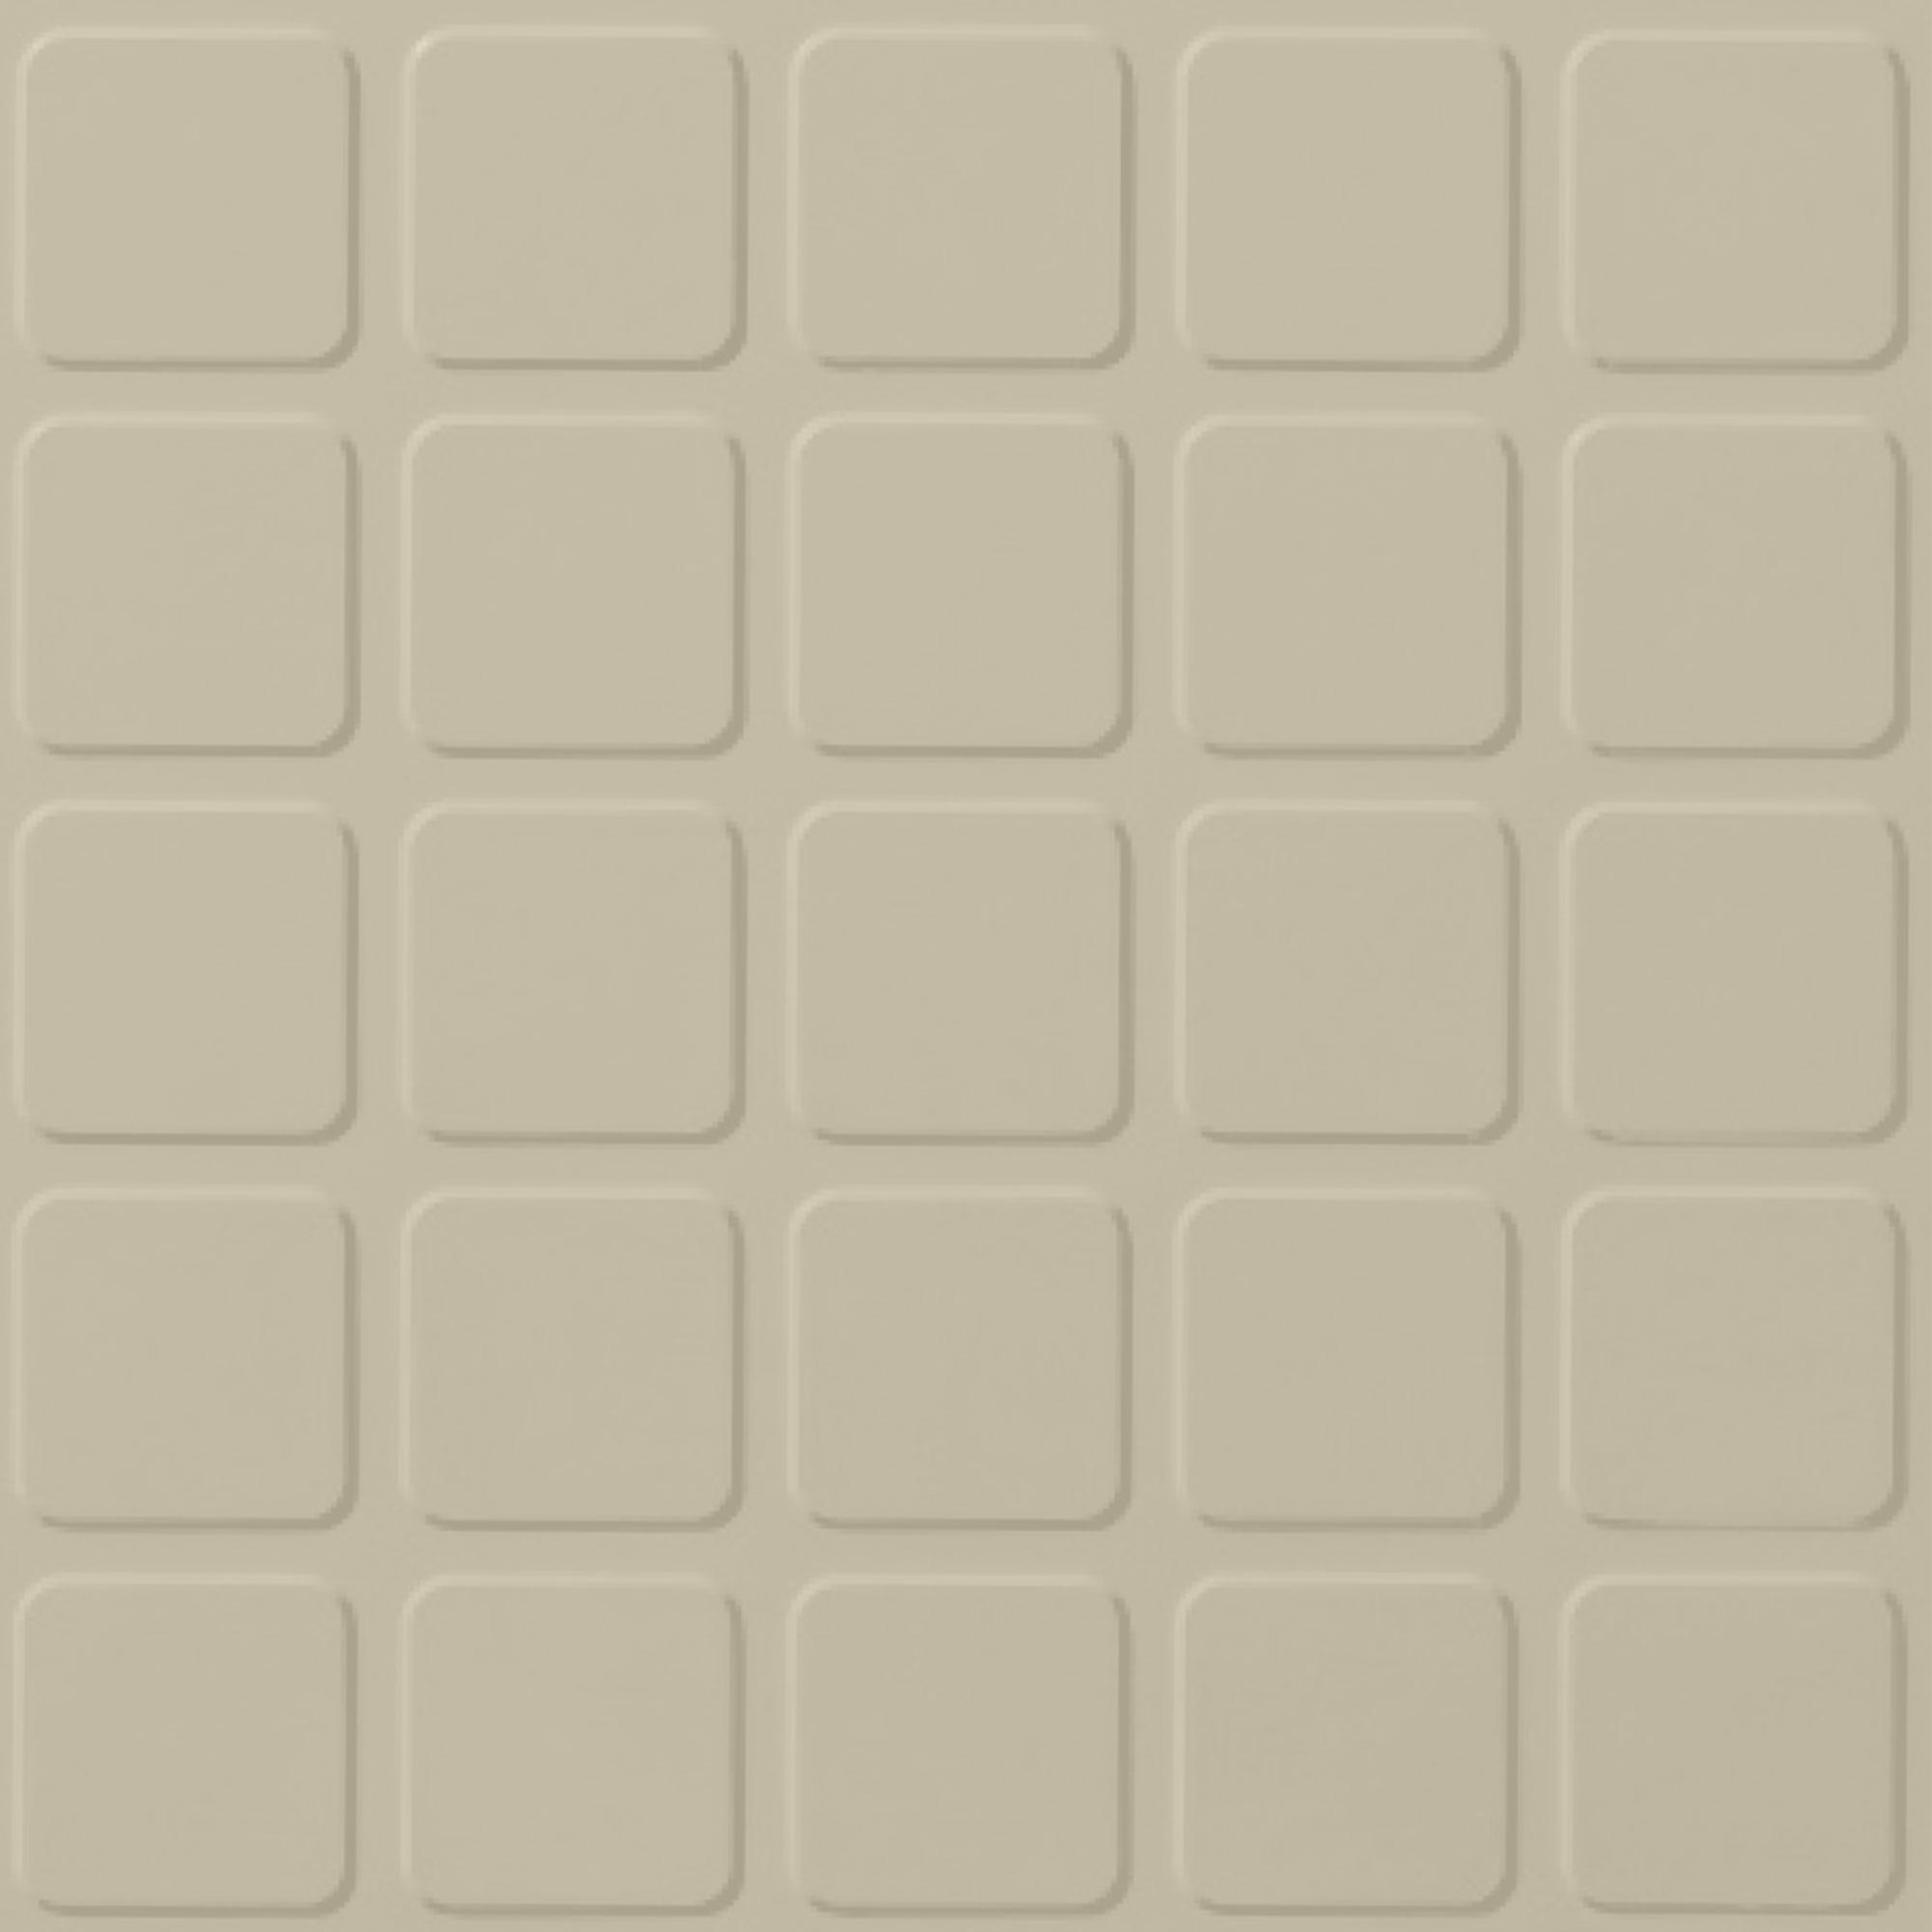 Roppe Rubber Tile 900 - Raised Square Design (994) Almond Rubber Flooring